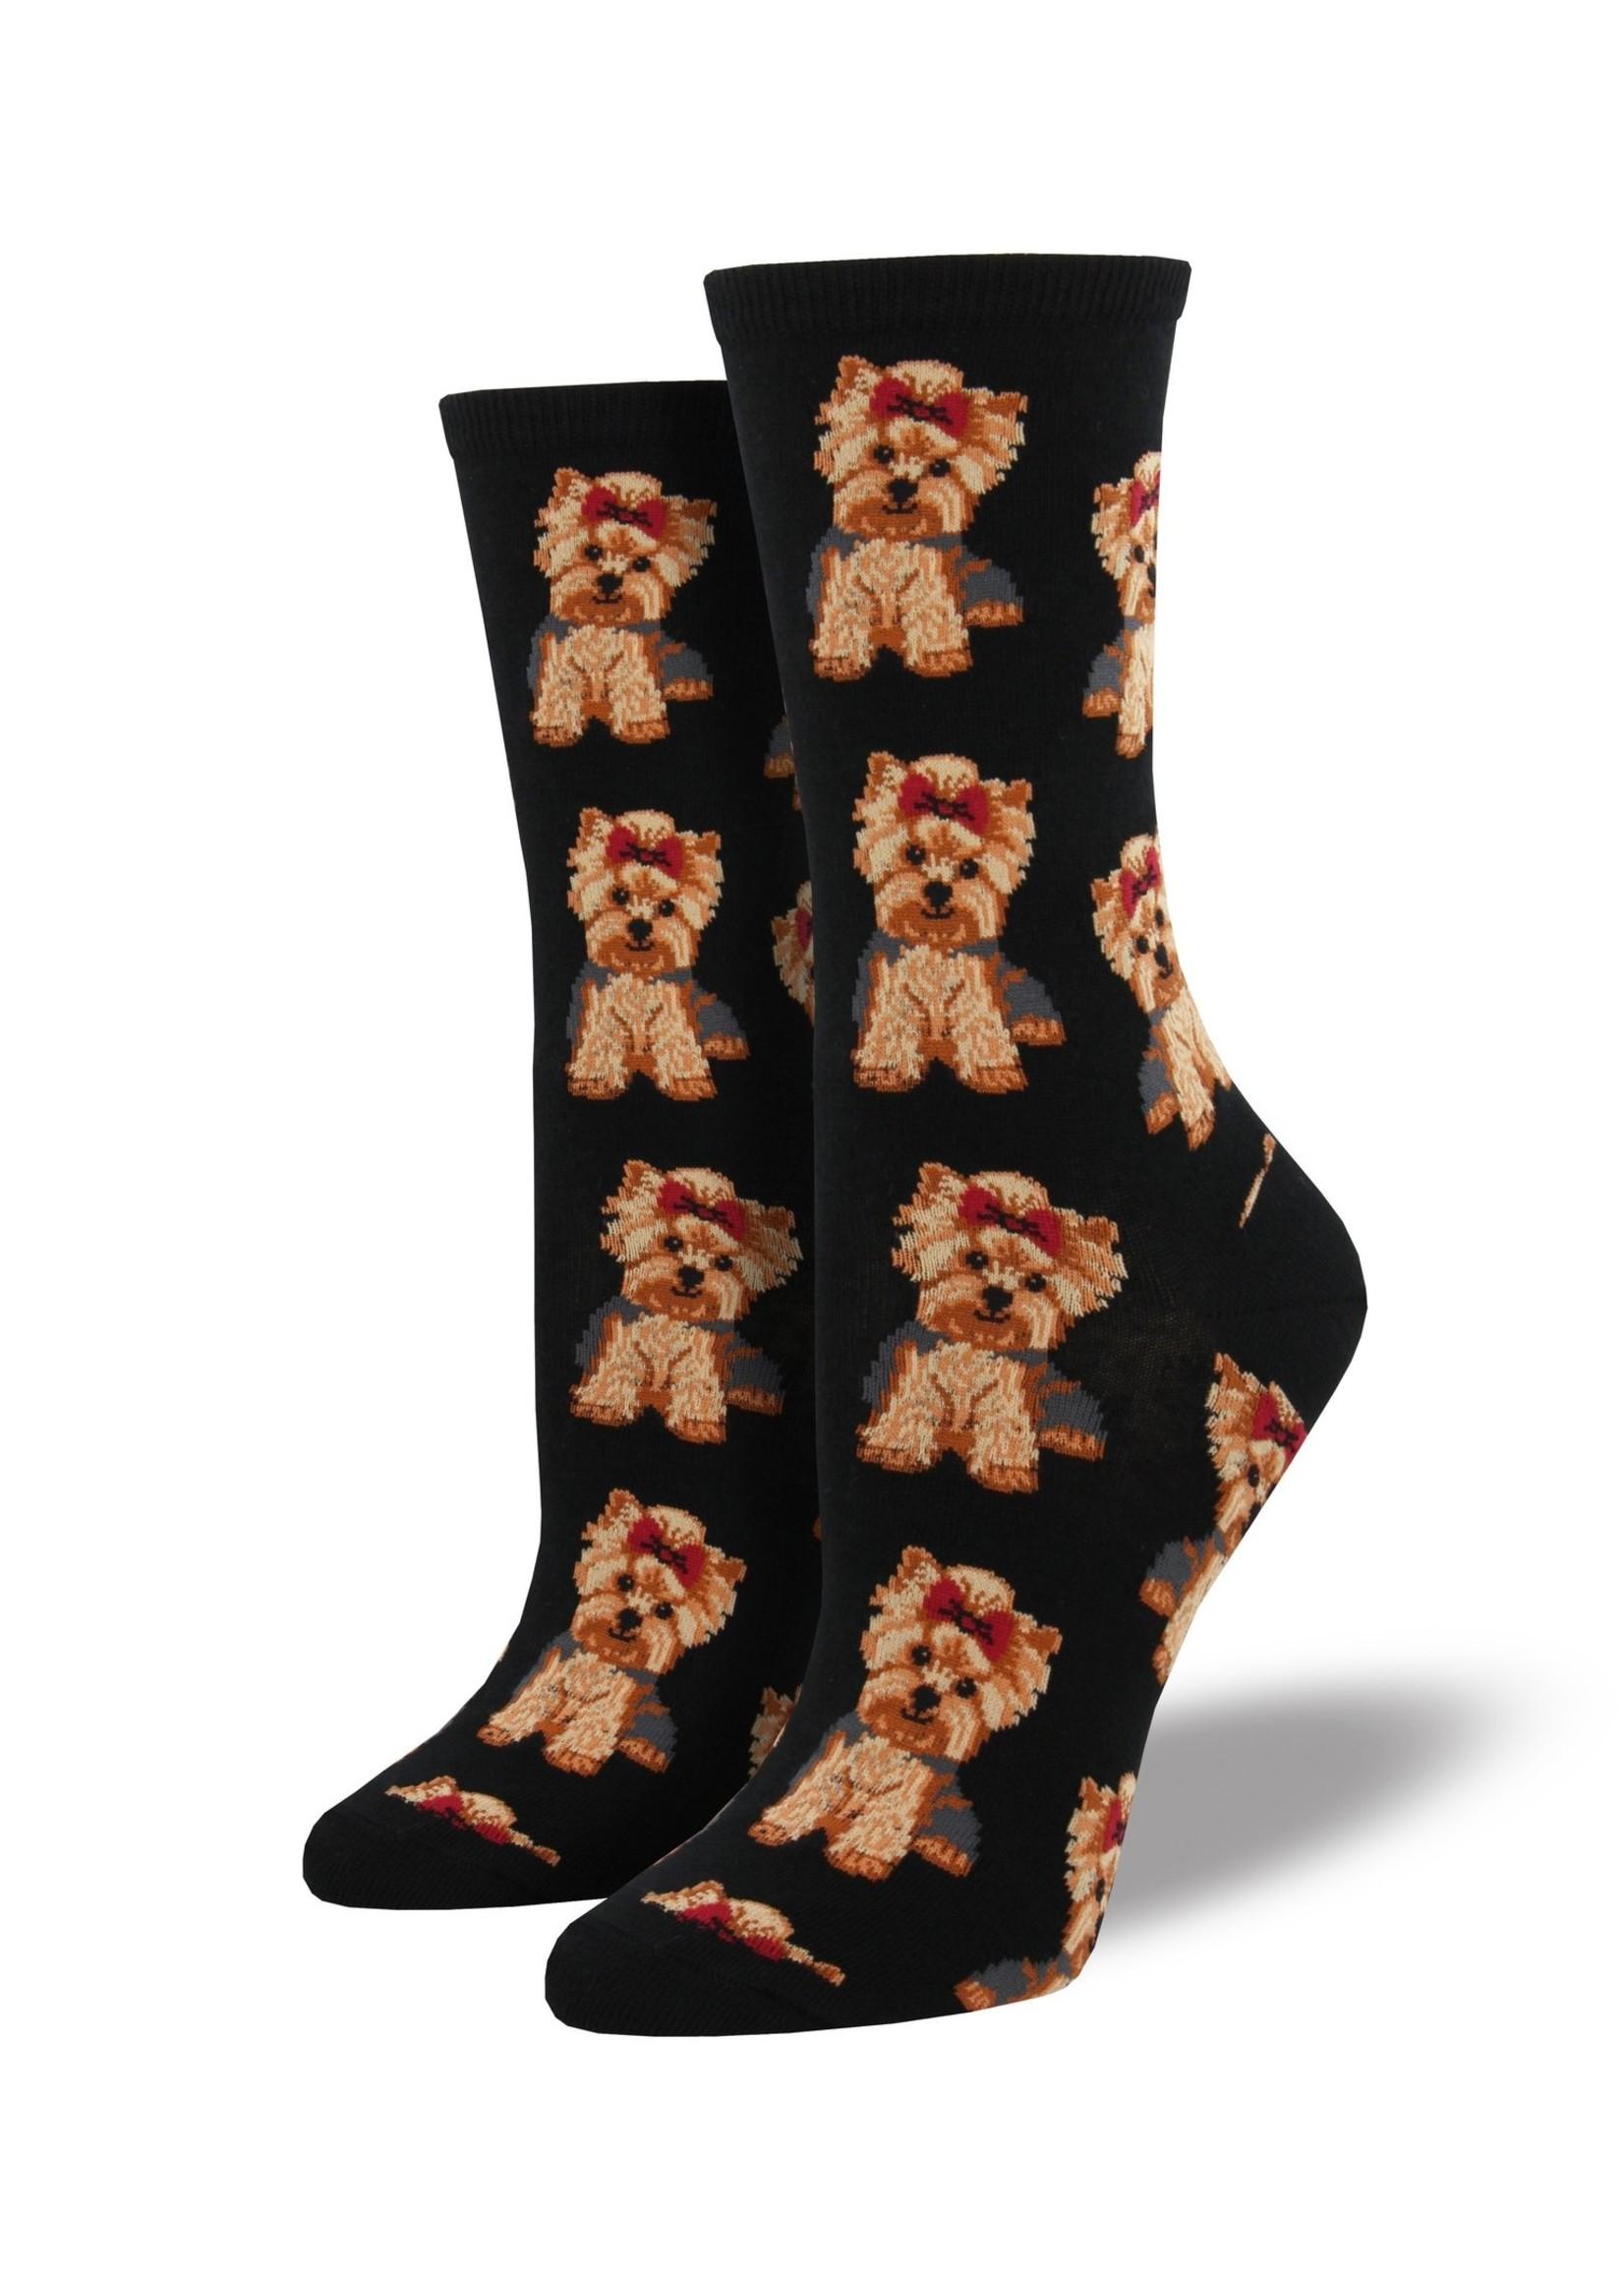 Socksmith Canada Inc WOMEN'S YORKIES SOCKS